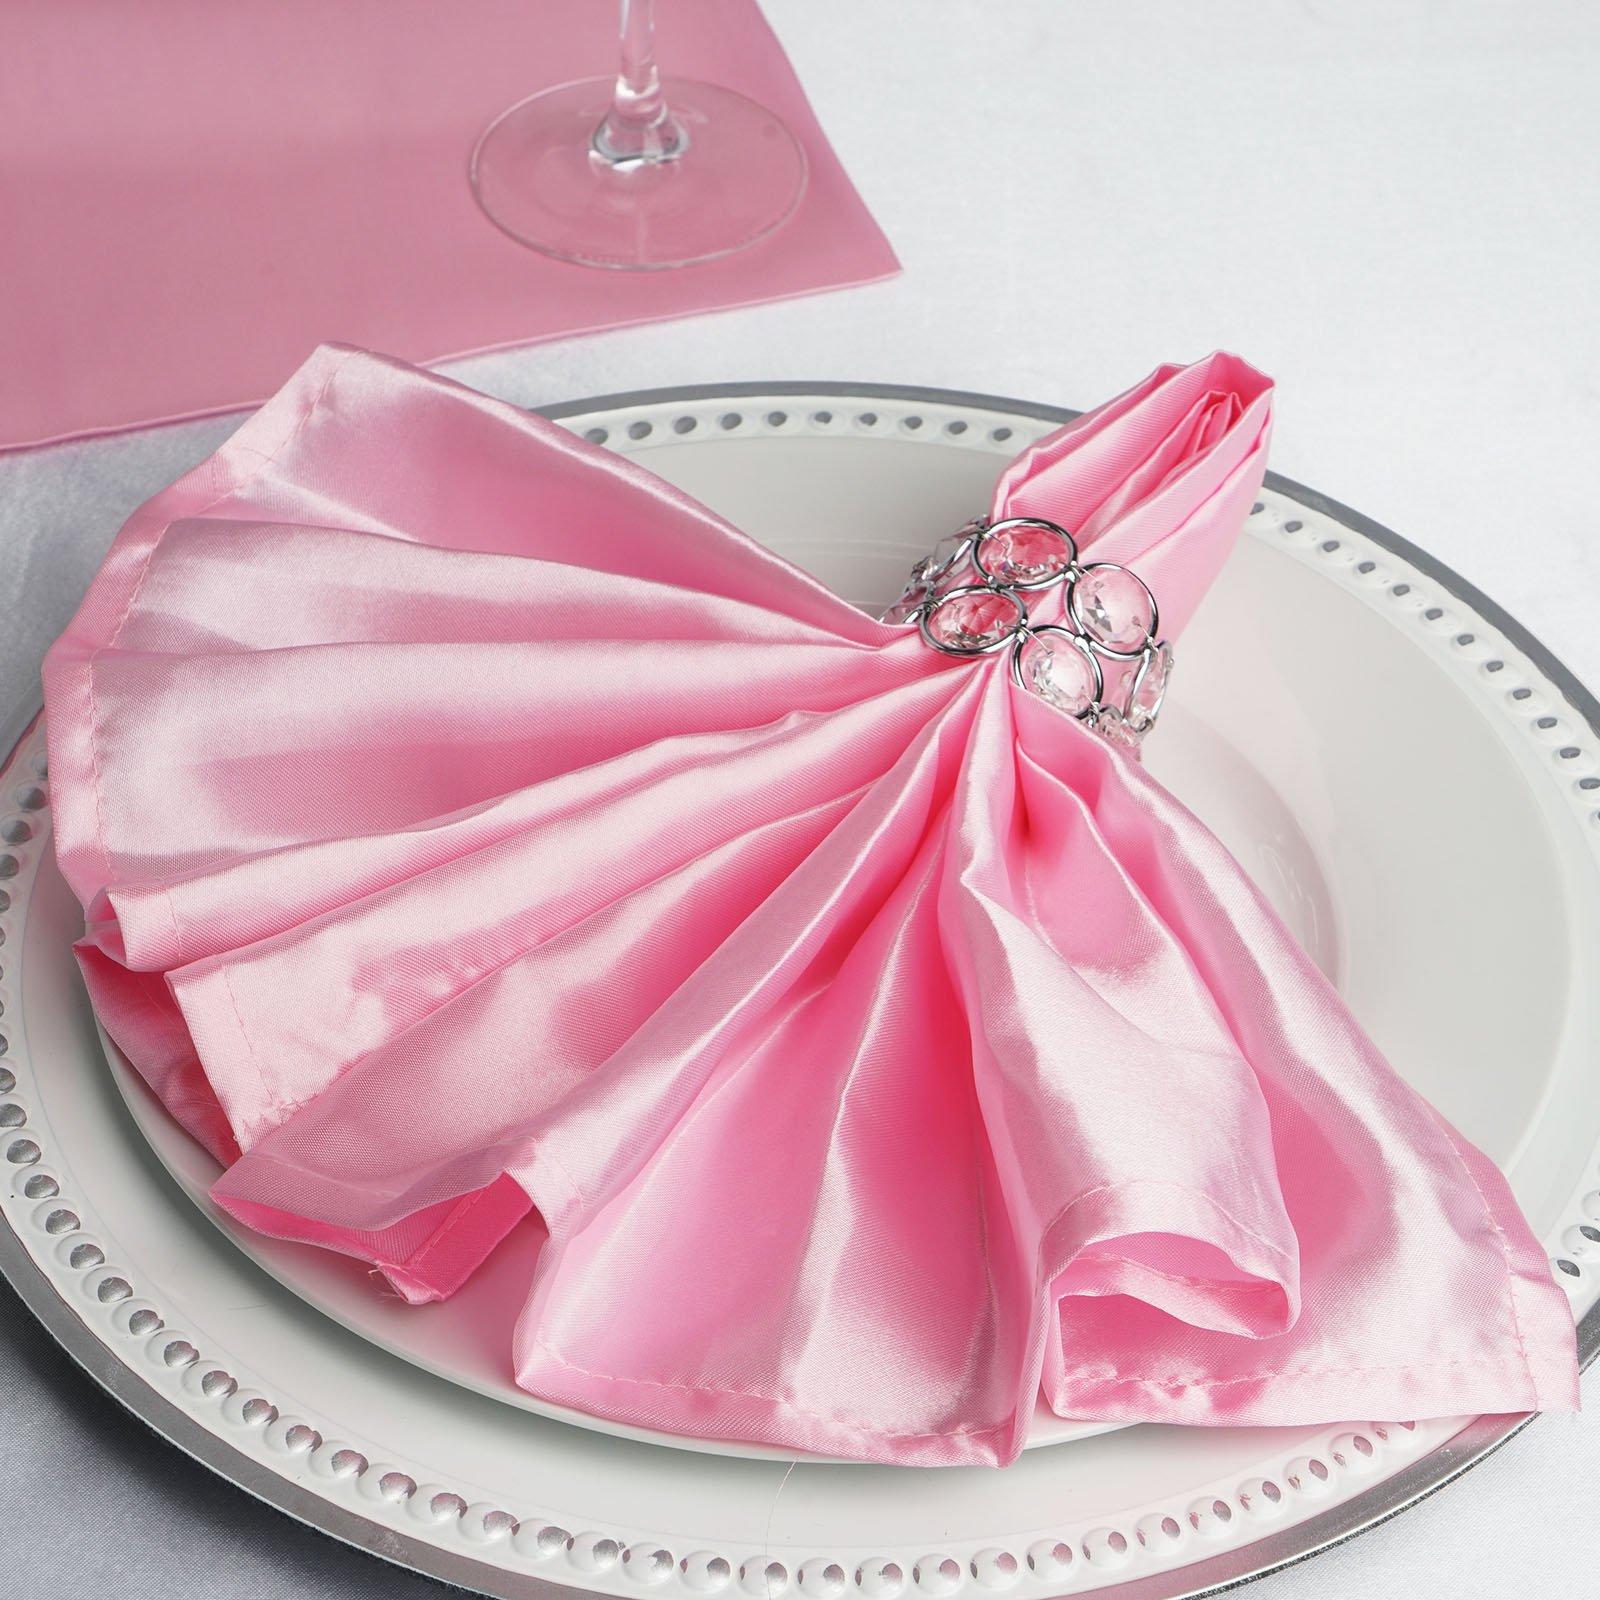 "Efavormart Pack of 5 Premium Washable 20""x20""  SATIN Linen Napkins For Wedding Birthday Restaurant Party Tableware Decoration"